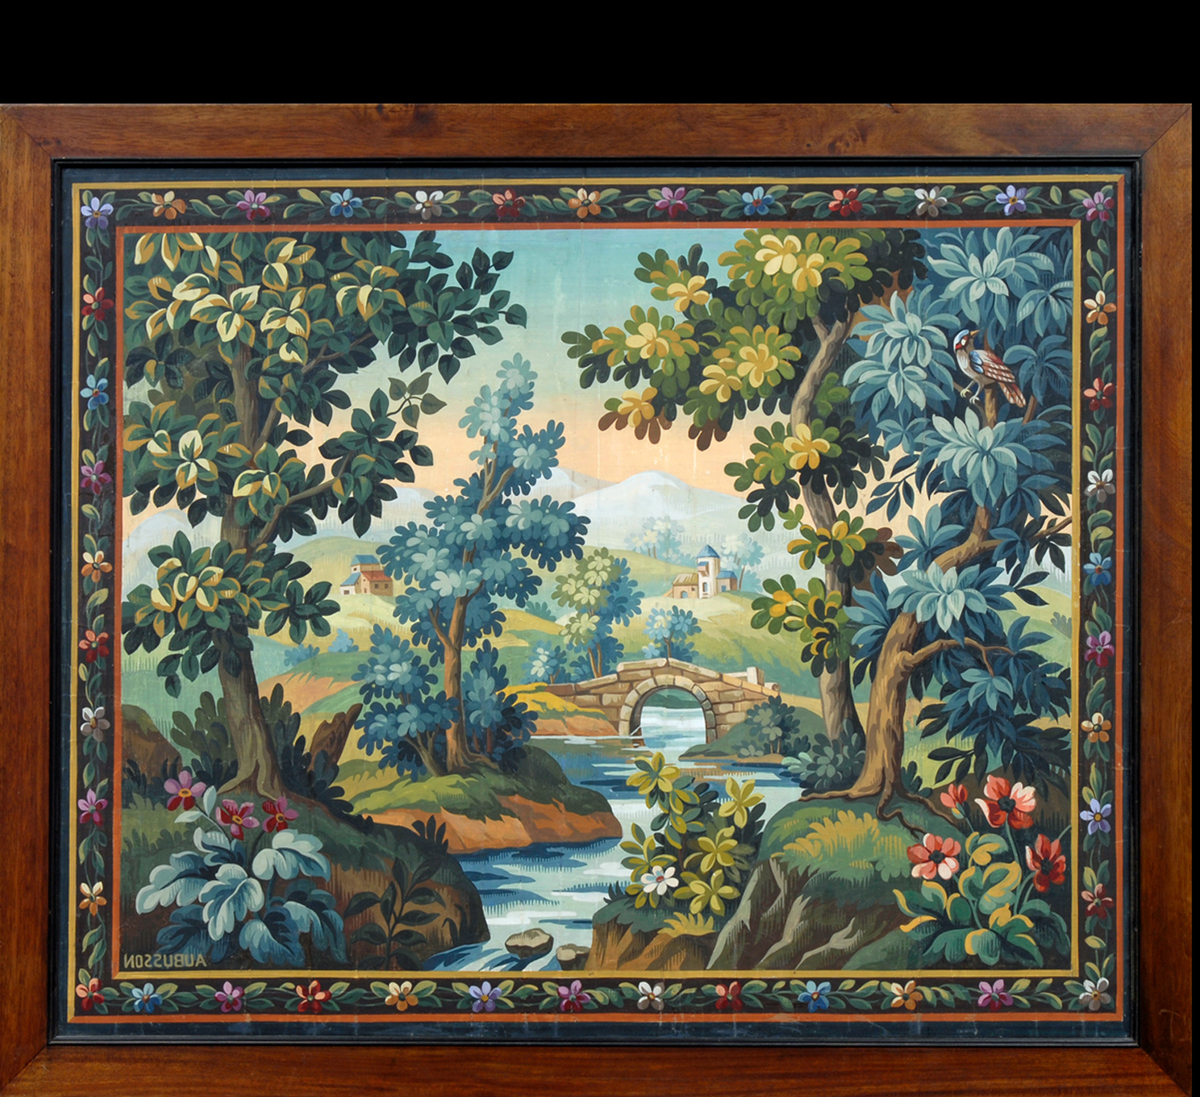 Antique Aubusson Tapestry Cartoon